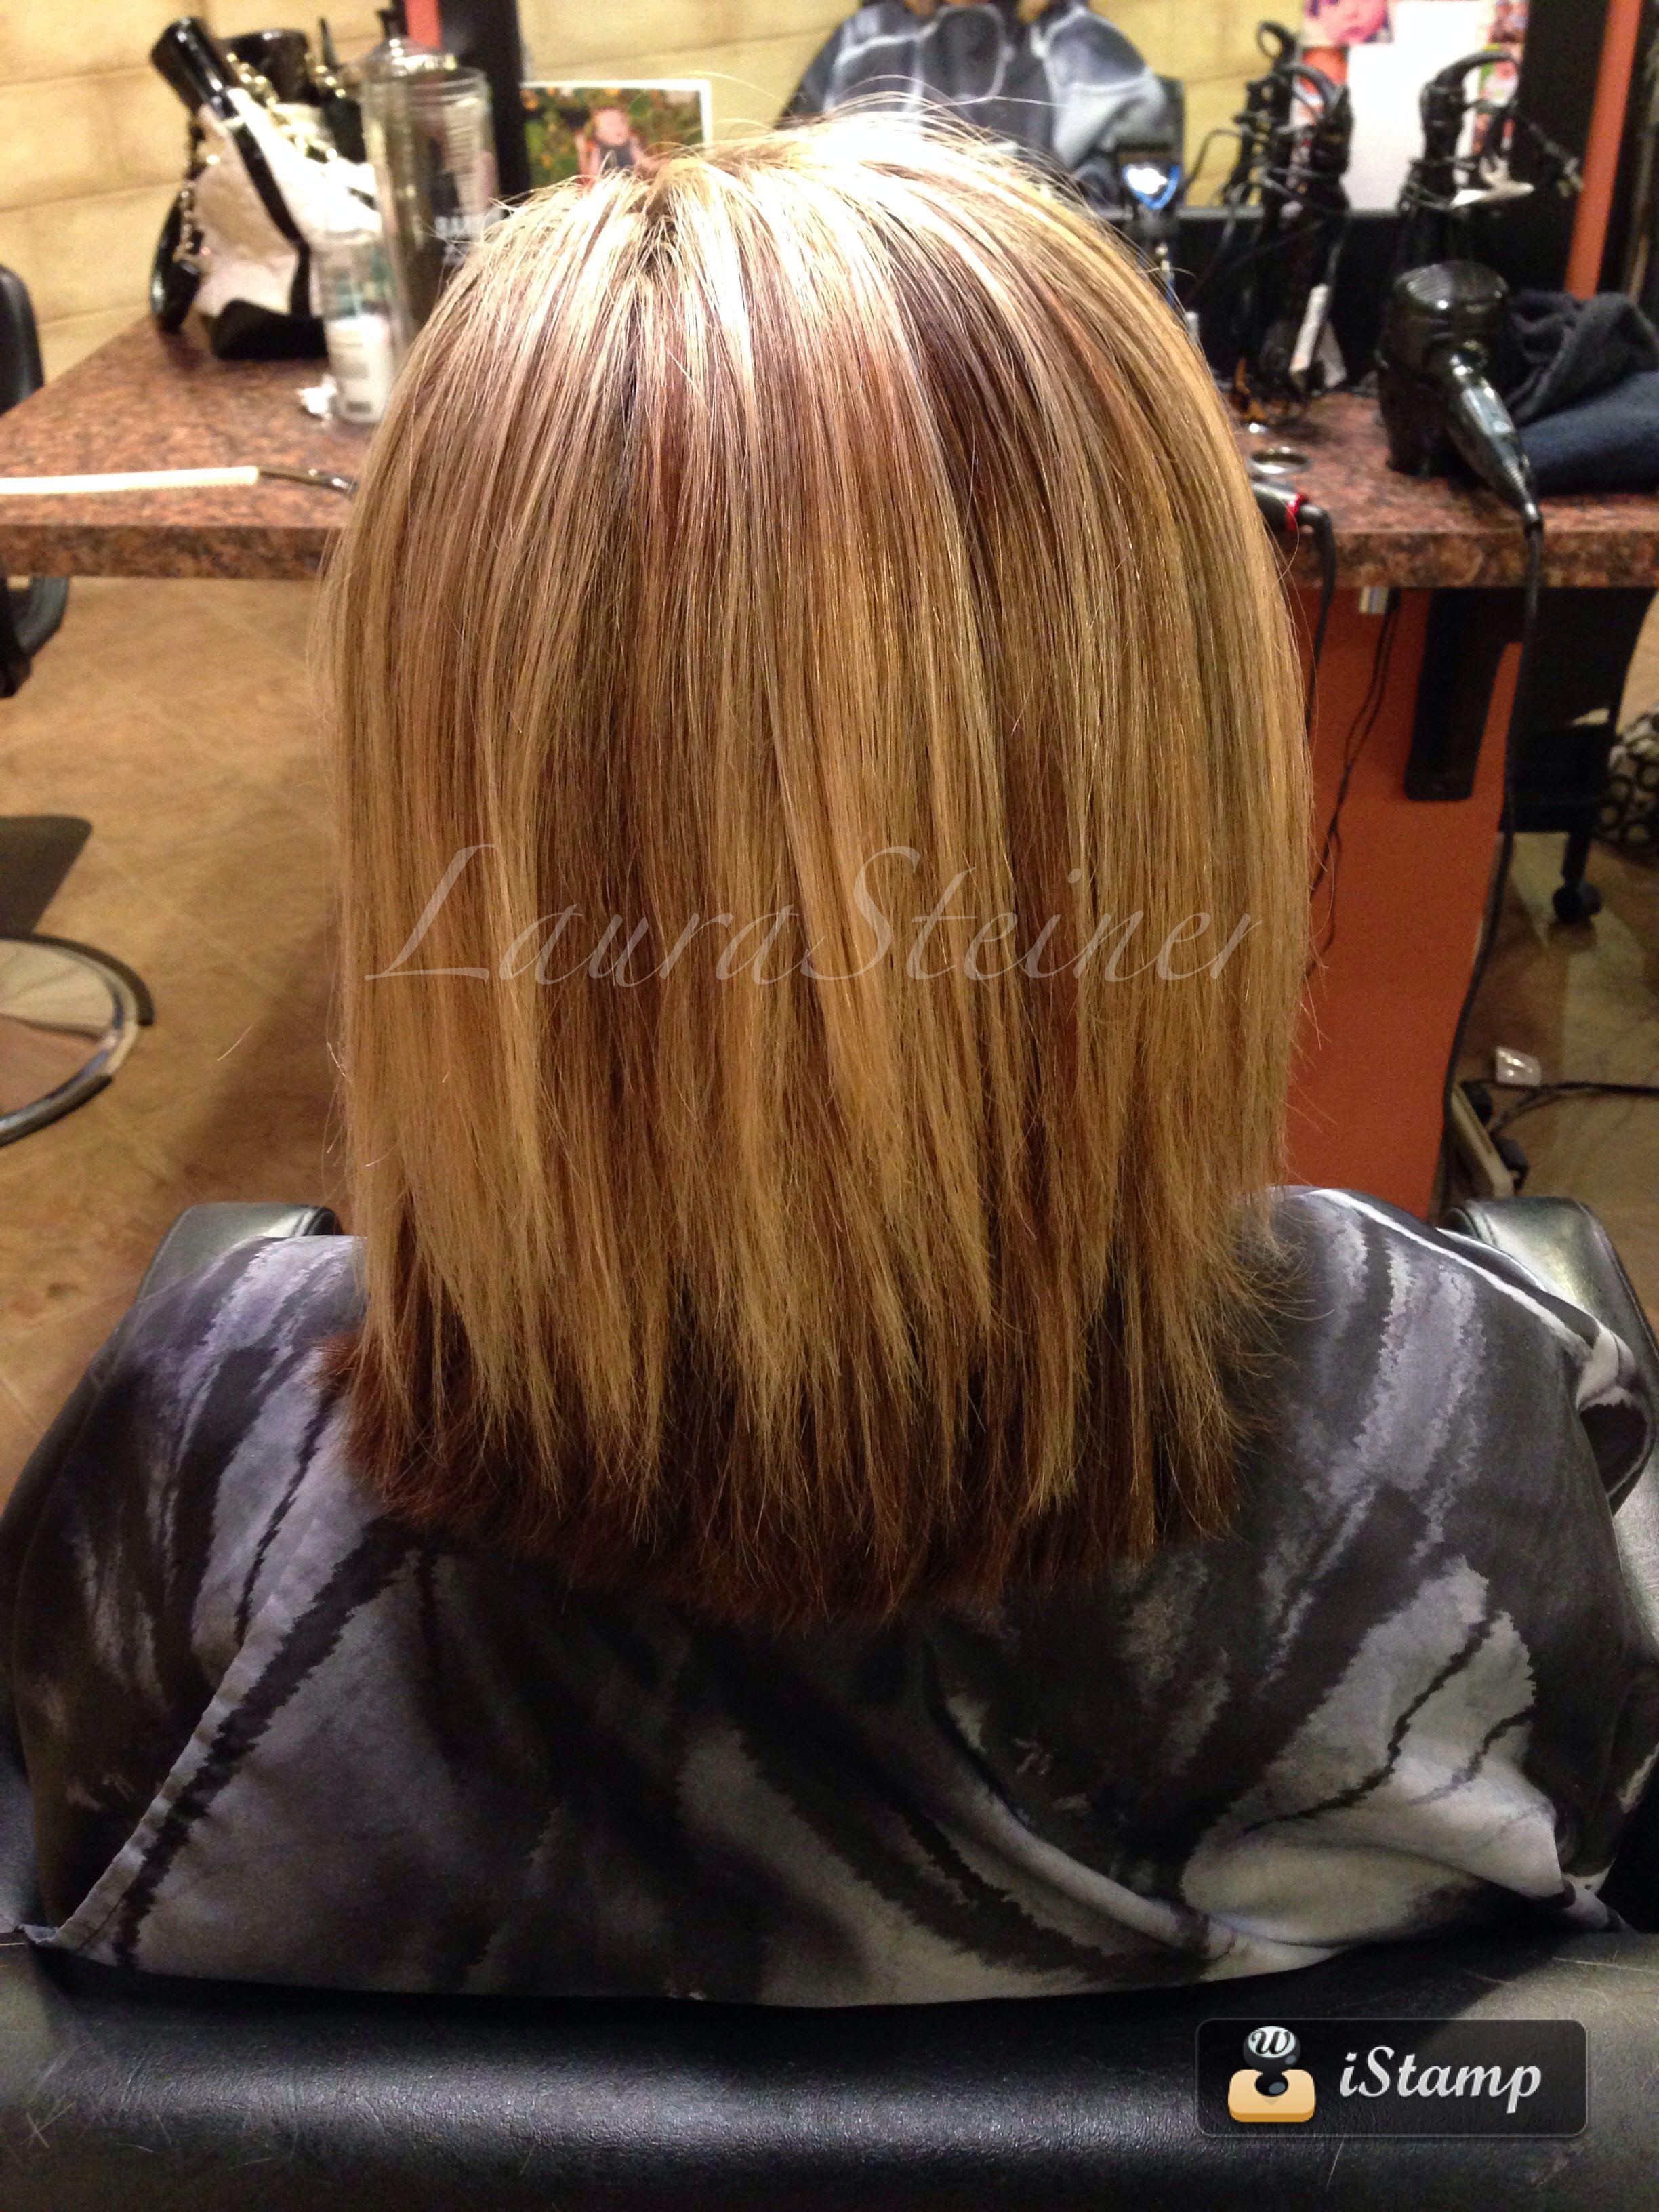 Pin By Laura Steiner On Hair By Laurasteiner Hair Styles Medium Length Hair Styles Medium Hair Styles